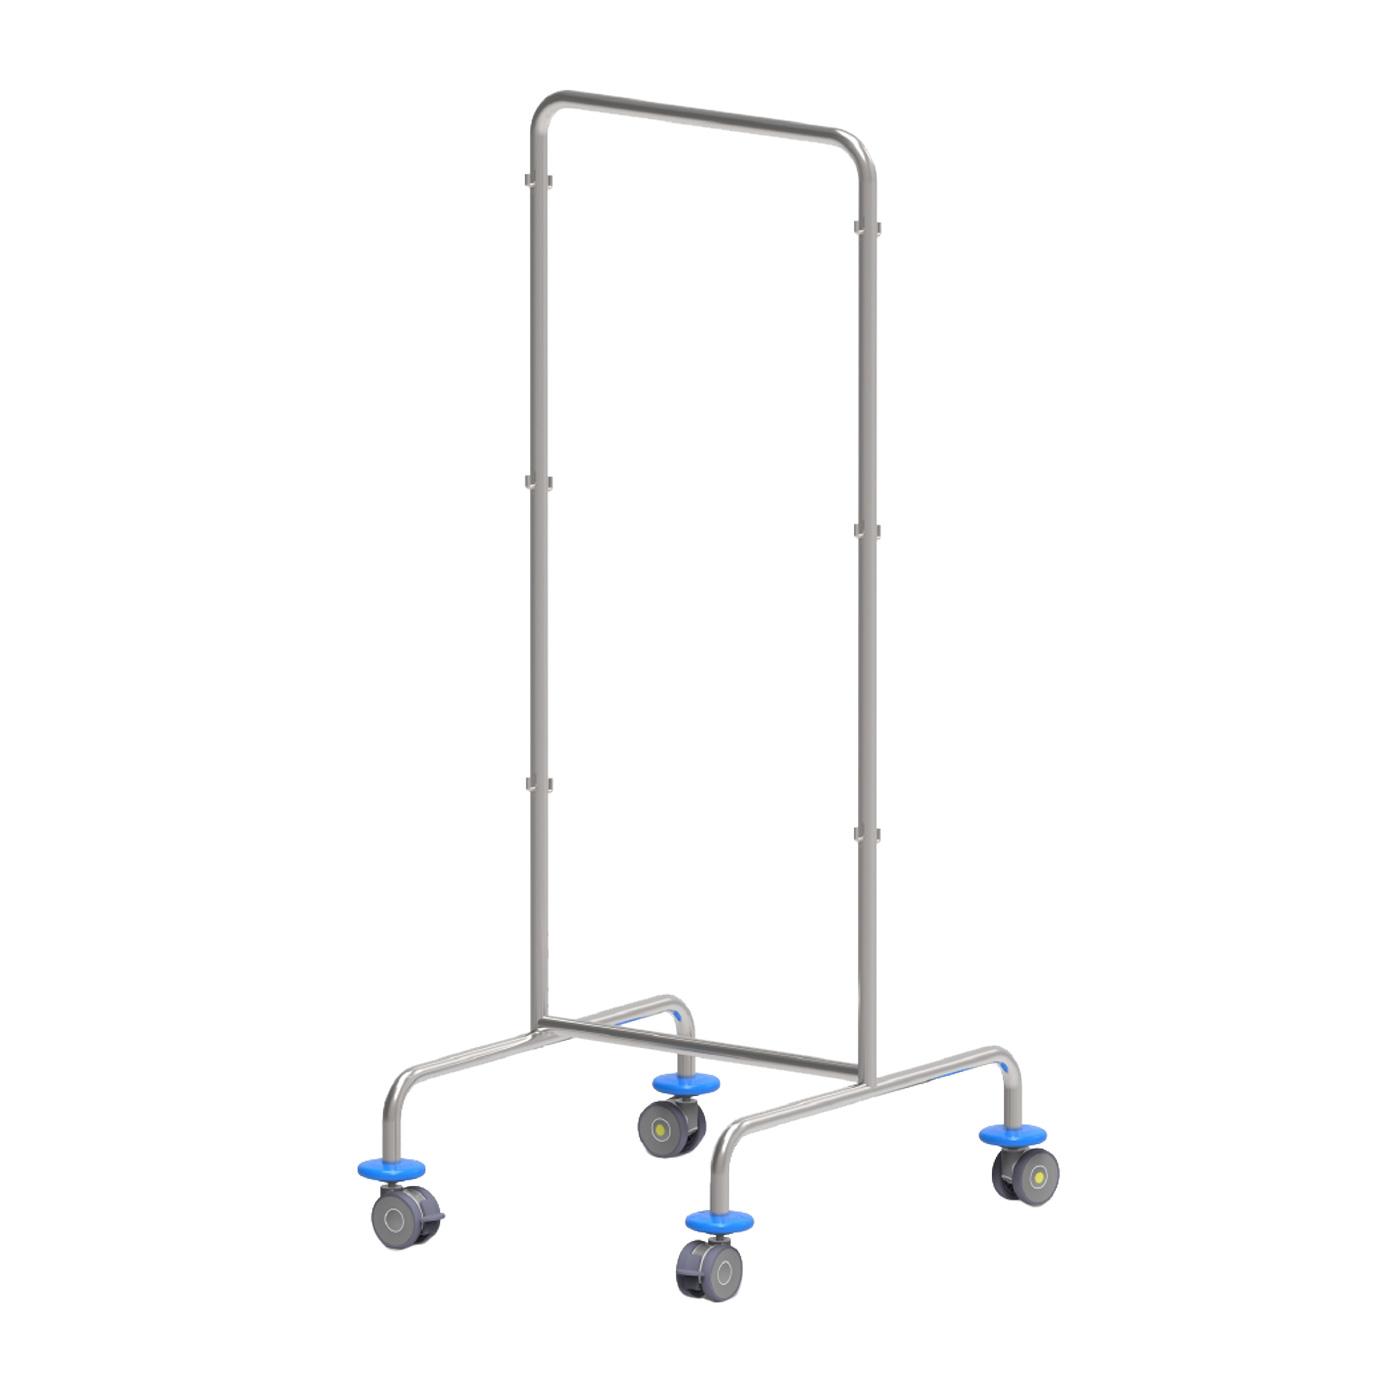 Gardhen Bilance - Carrello modulare